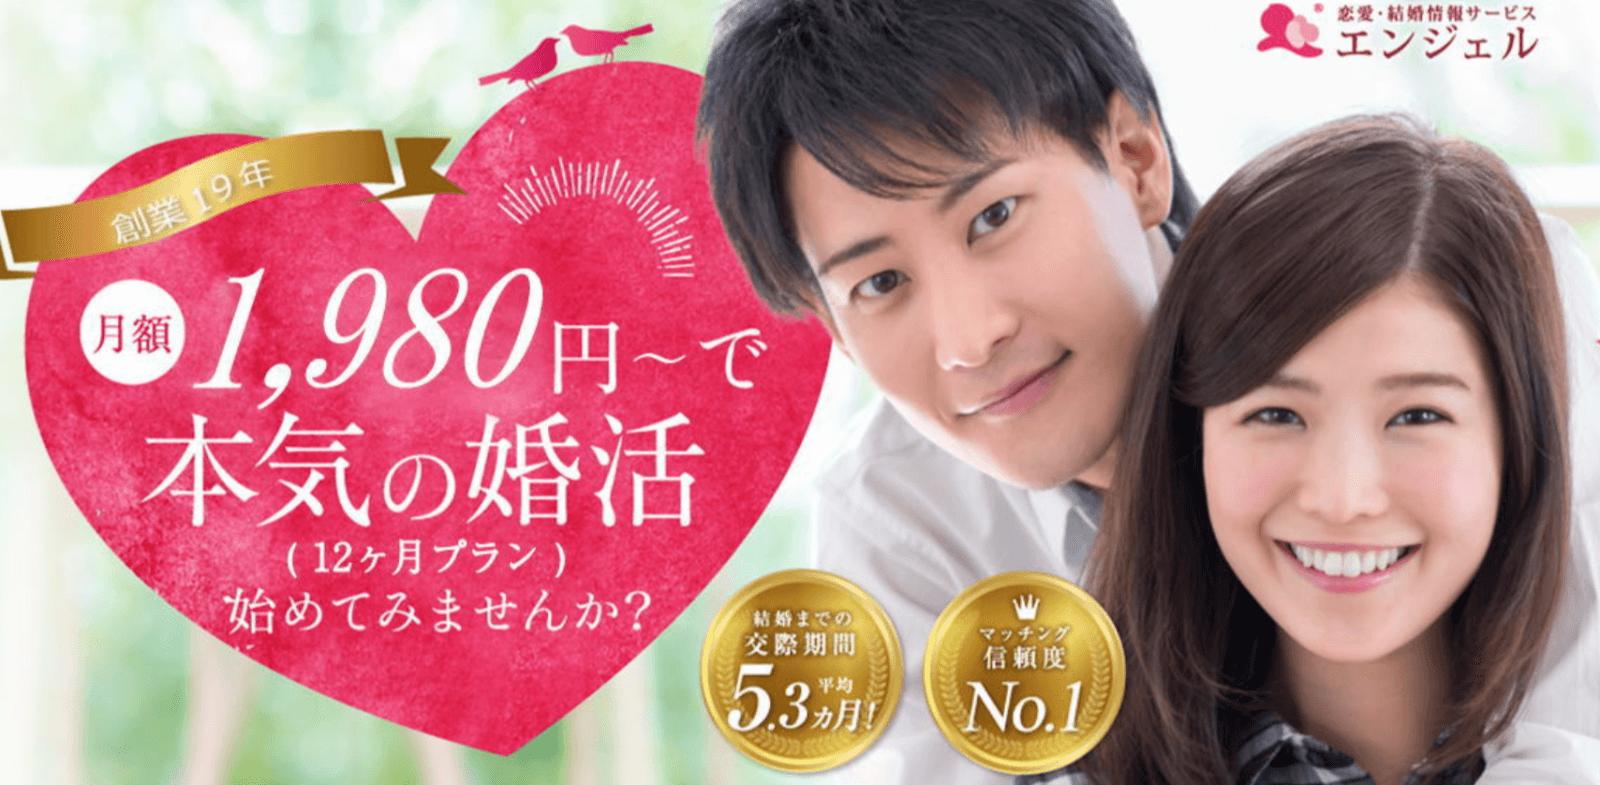 FireShot Capture 124 - 出会いと結婚を提供する婚活サイト - エンジェル - www.angelclub.jp